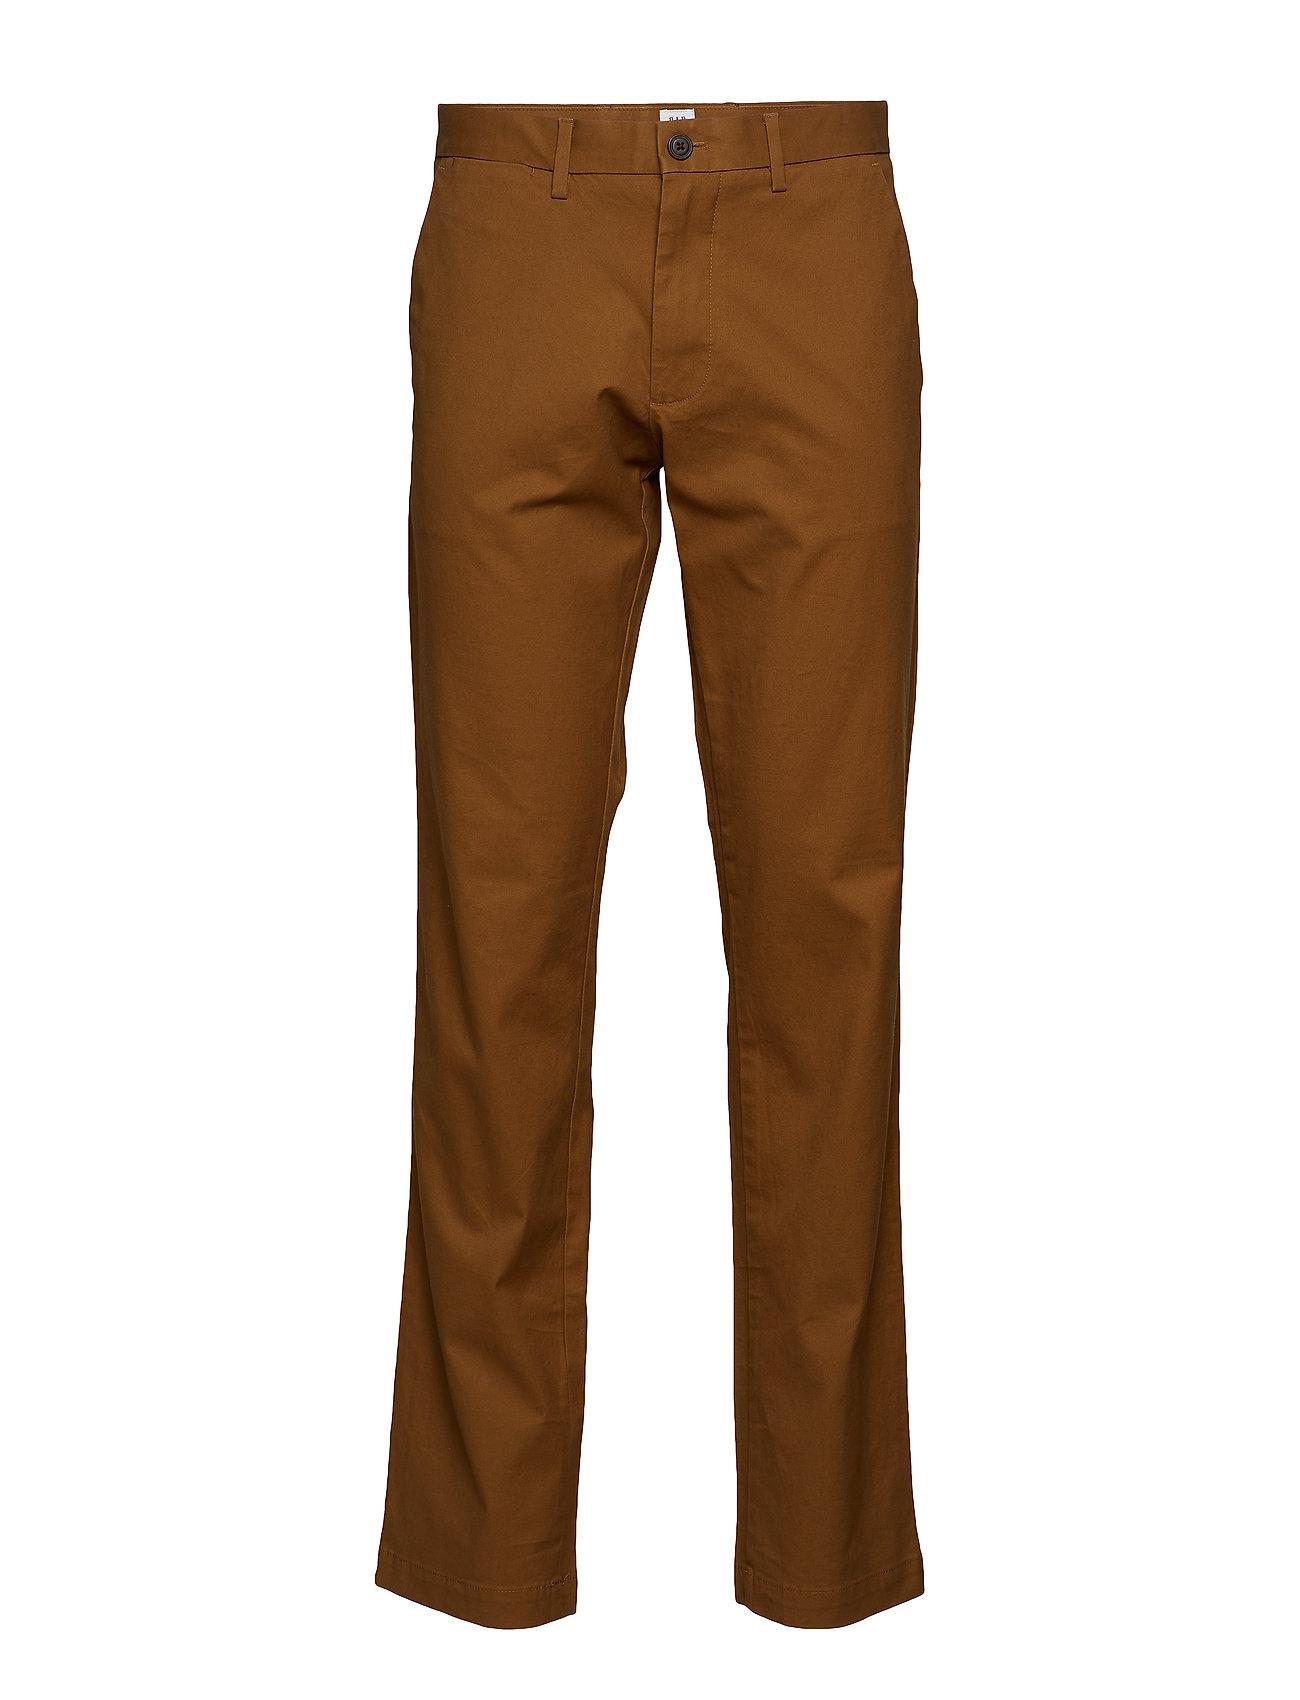 GAP Original Khakis in Straight Fit with GapFlex - PALOMINO BROWN GLOBAL